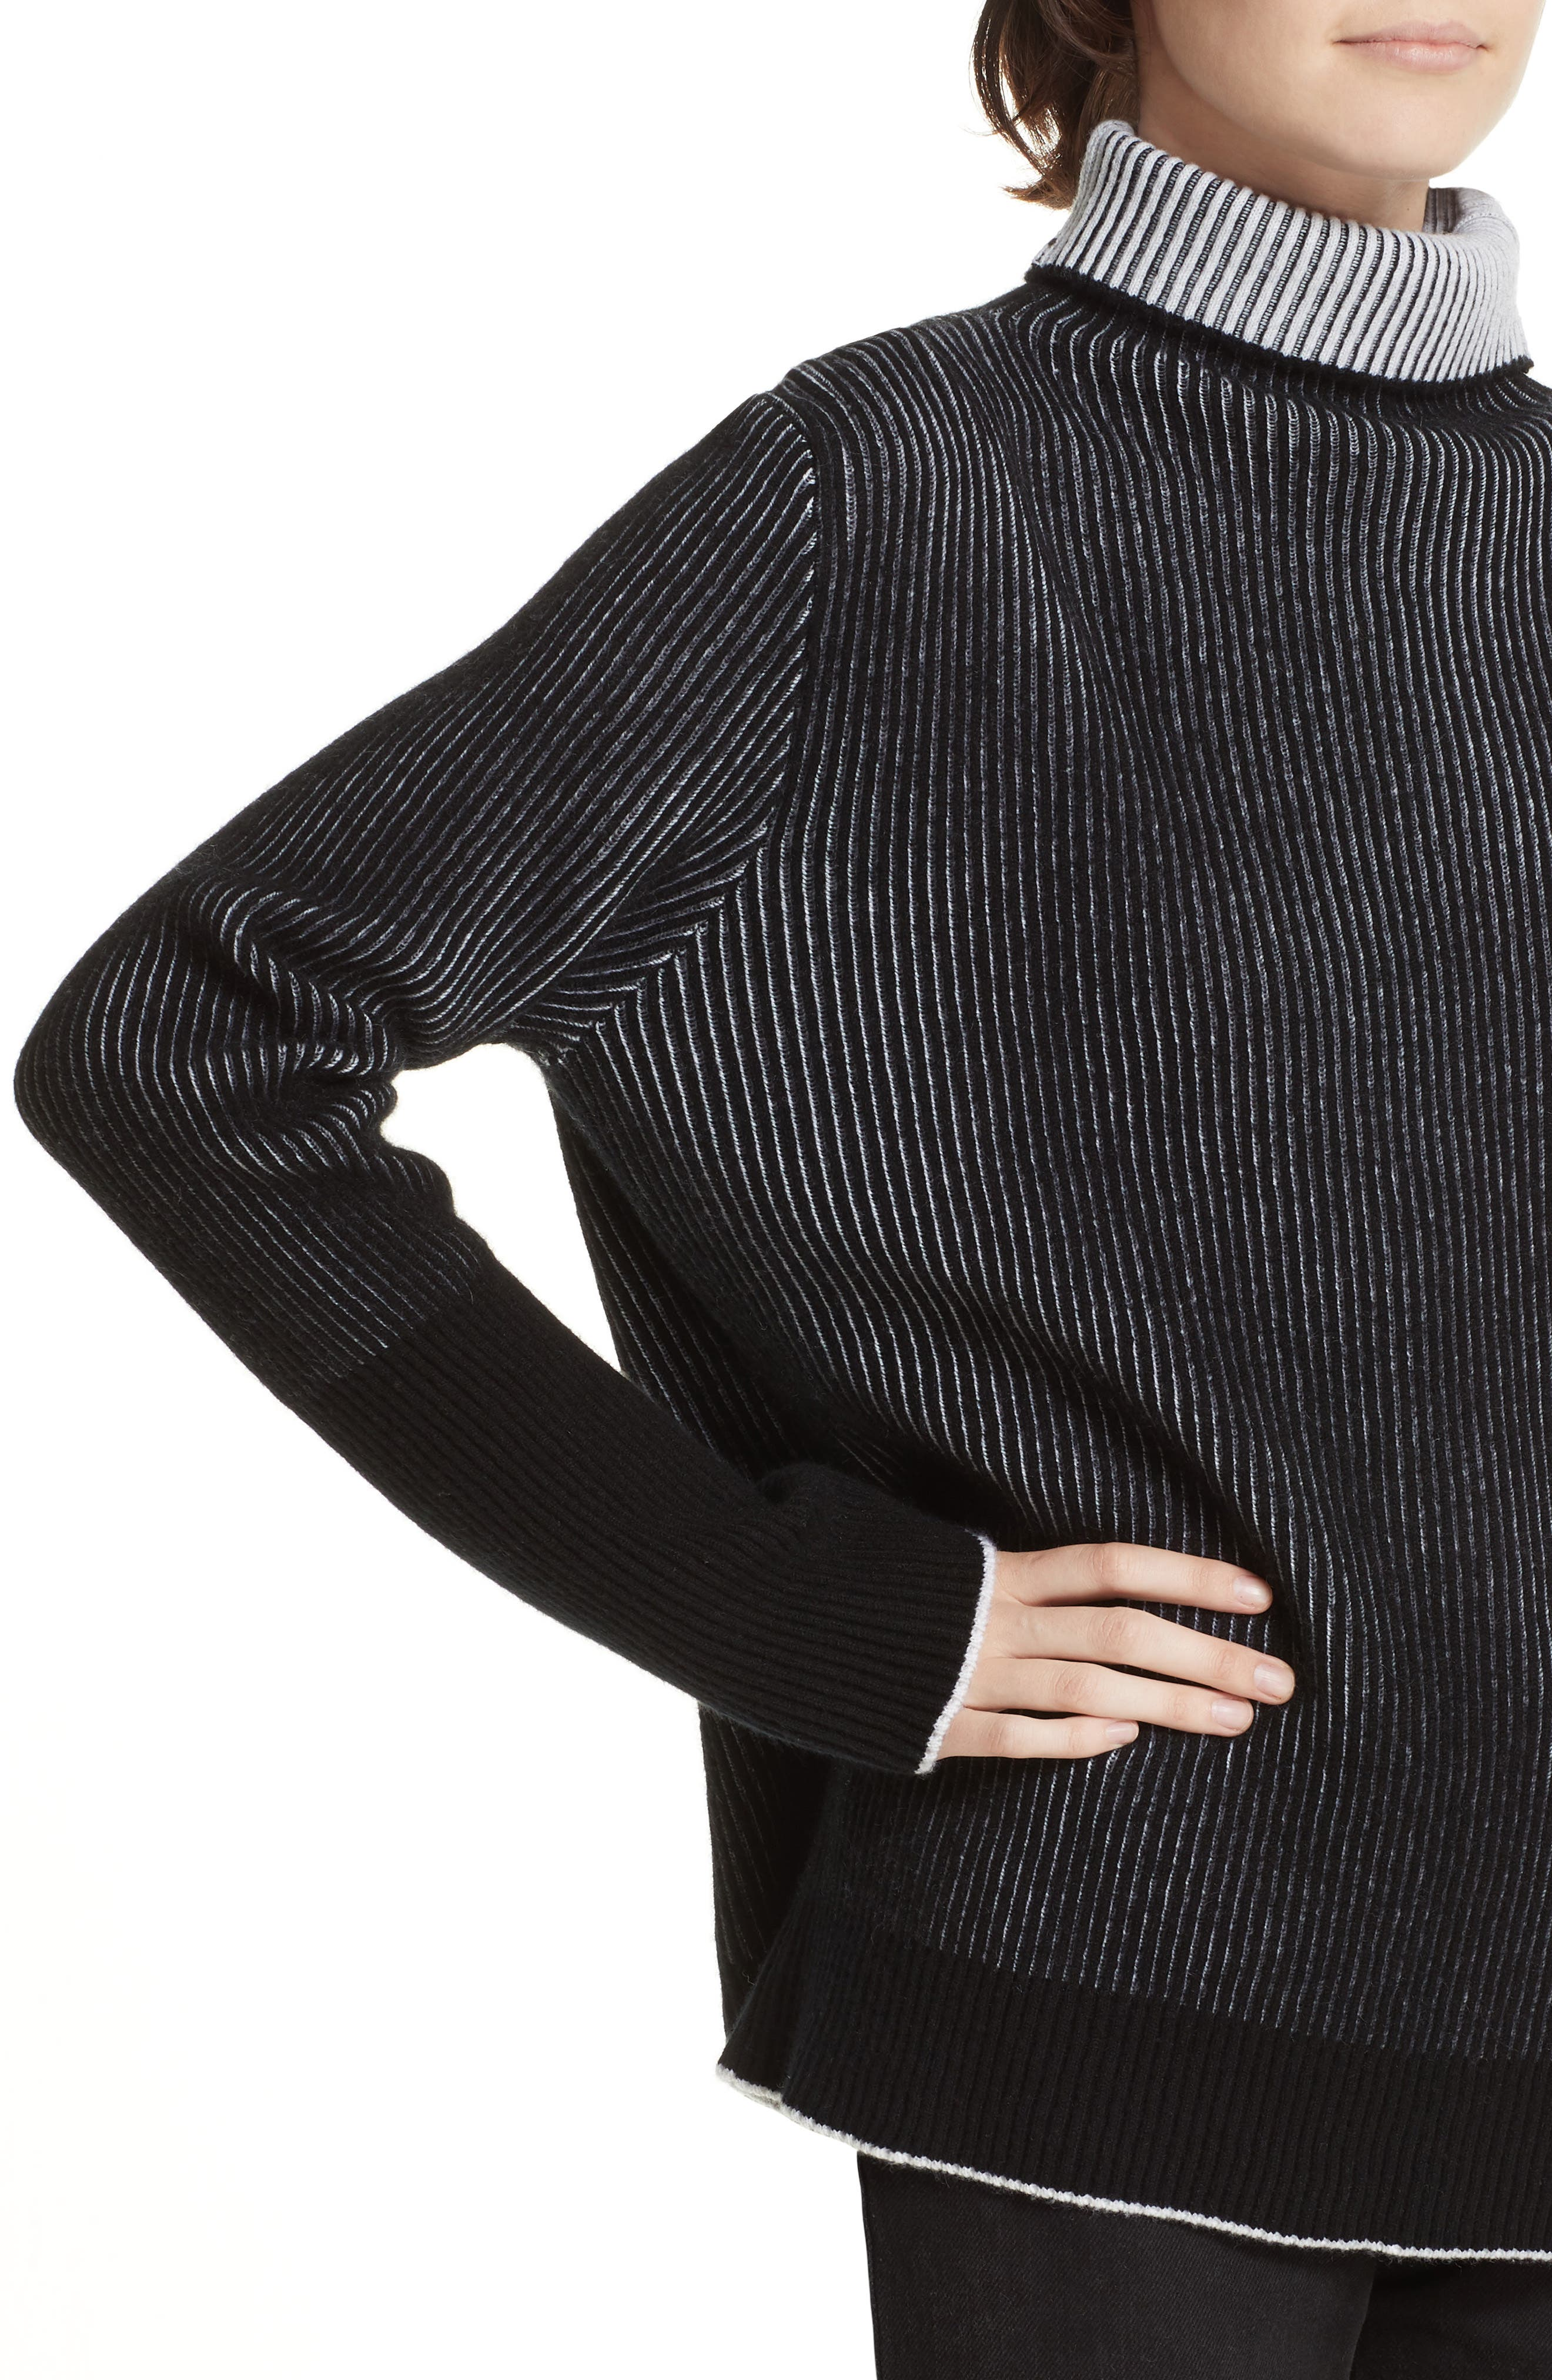 AAA Turtleneck Cashmere Sweater,                             Alternate thumbnail 4, color,                             BLACK/ CREAM